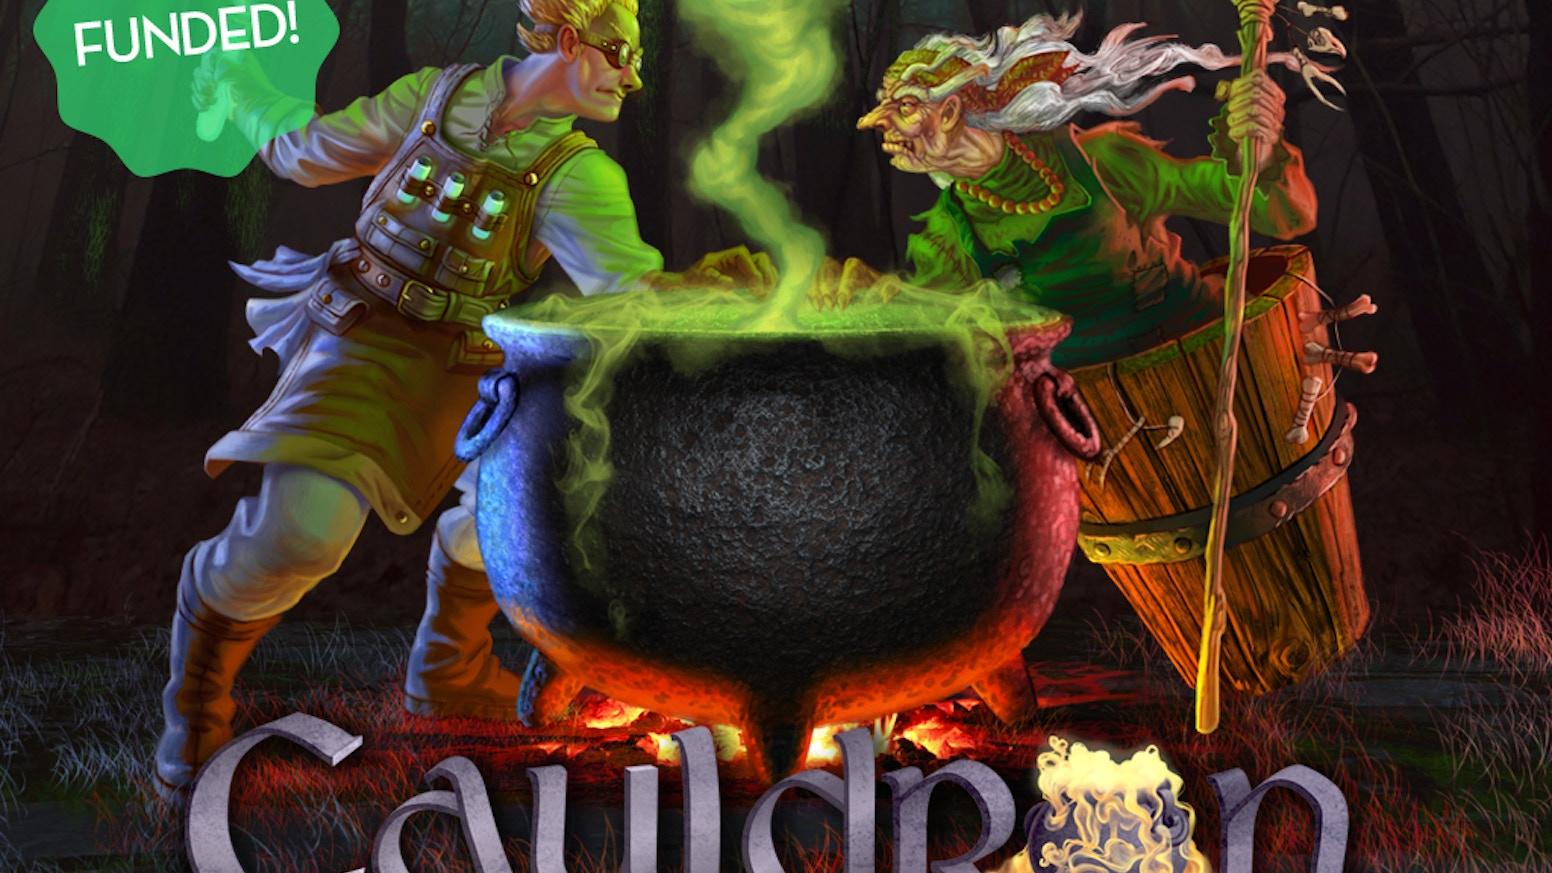 Cauldron: A board game of competitive alchemy by Artem Safarov